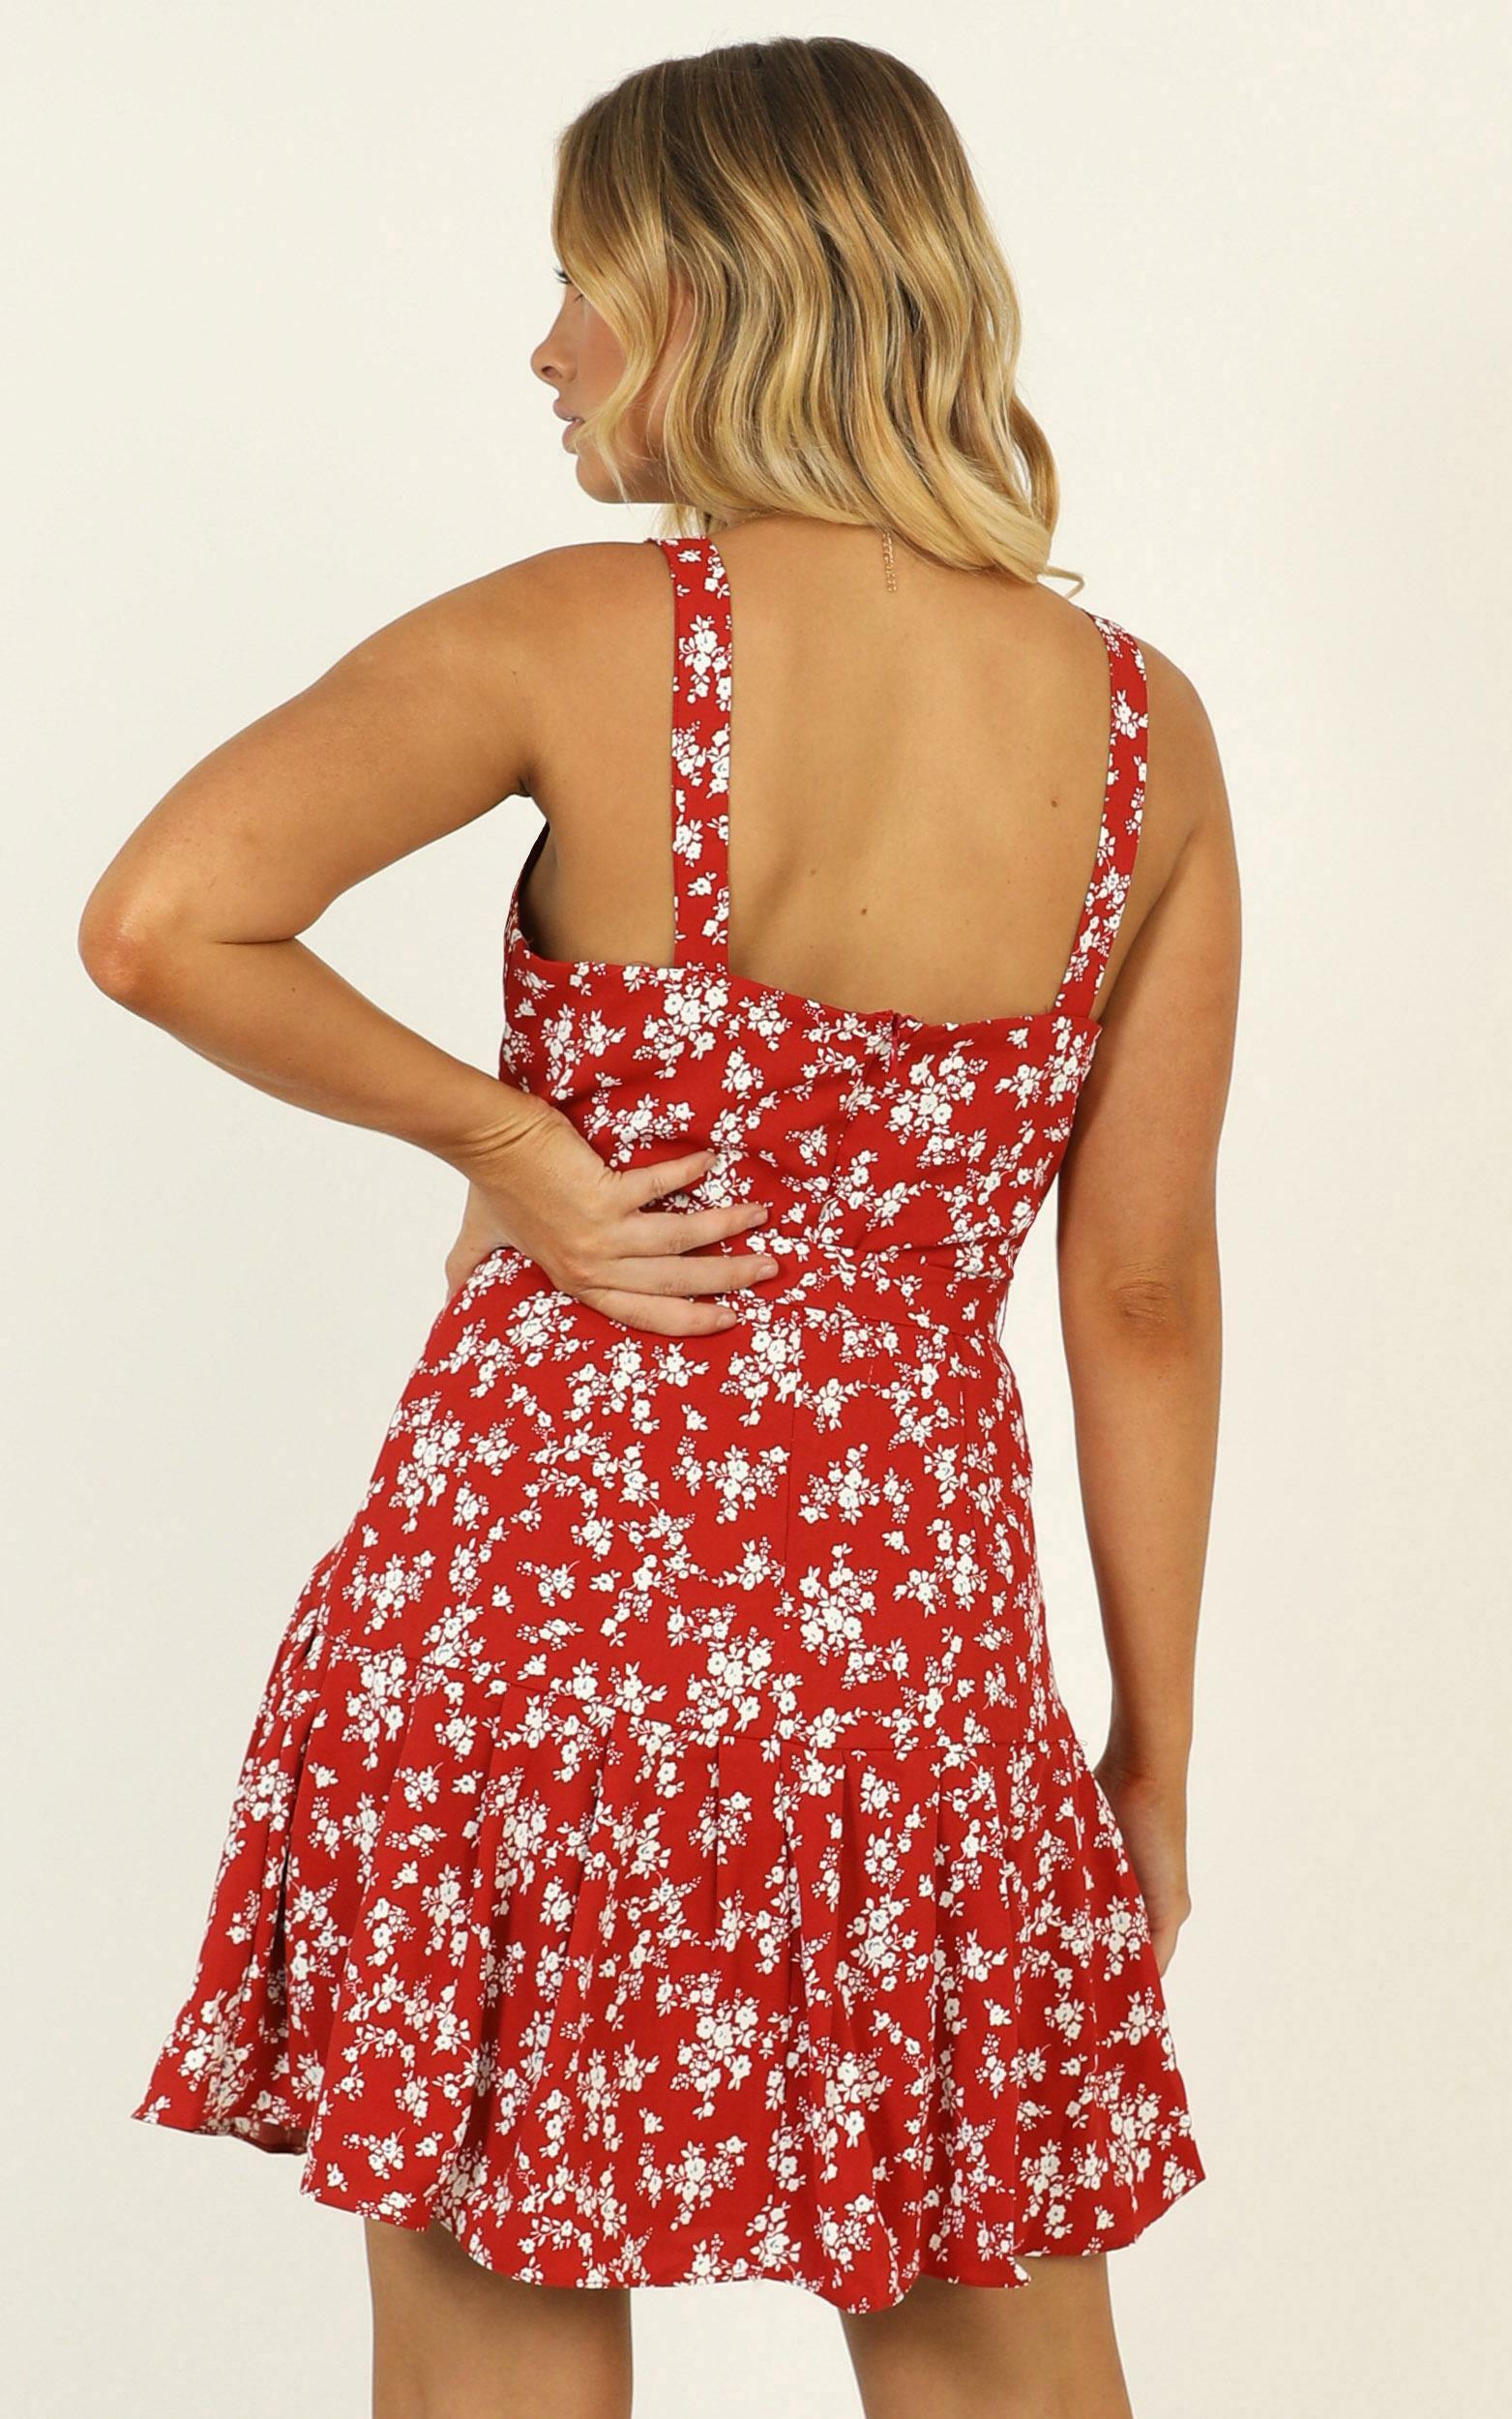 Biggest Comeback dress in red floral - 14 (XL), Red, hi-res image number null